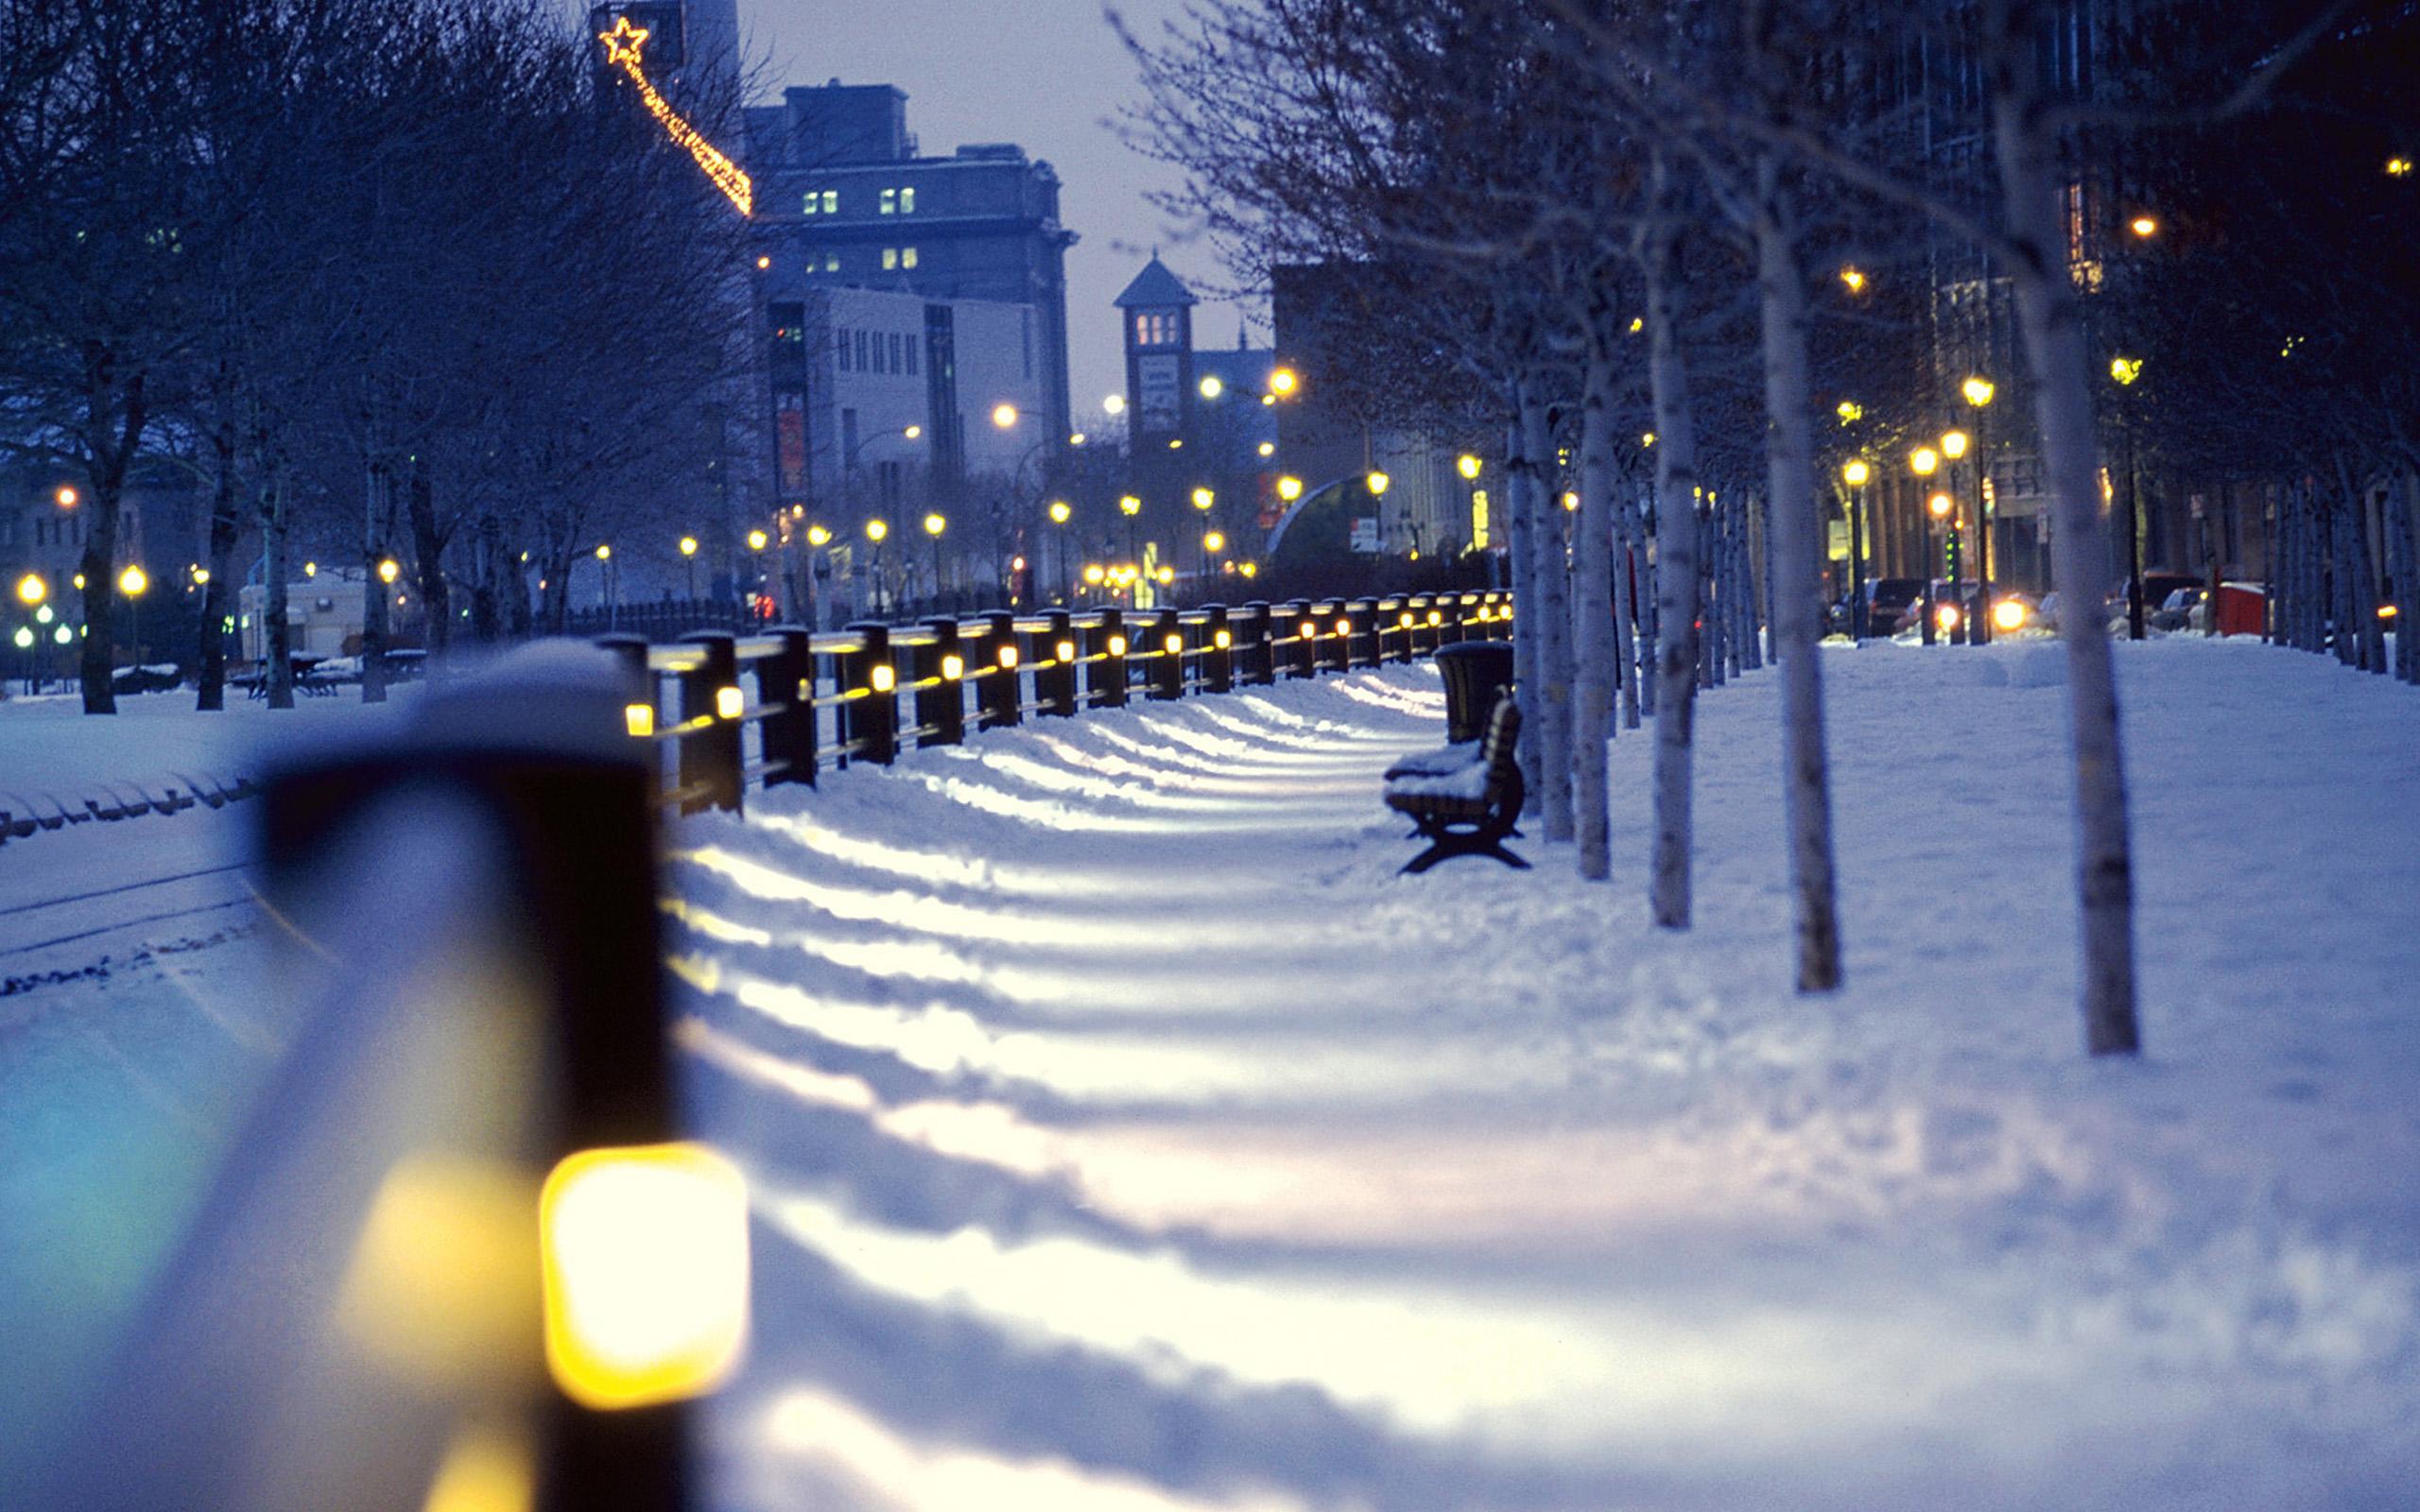 Winter Nature Wallpapers HD 11467 Wallpaper Download HD 2560x1600